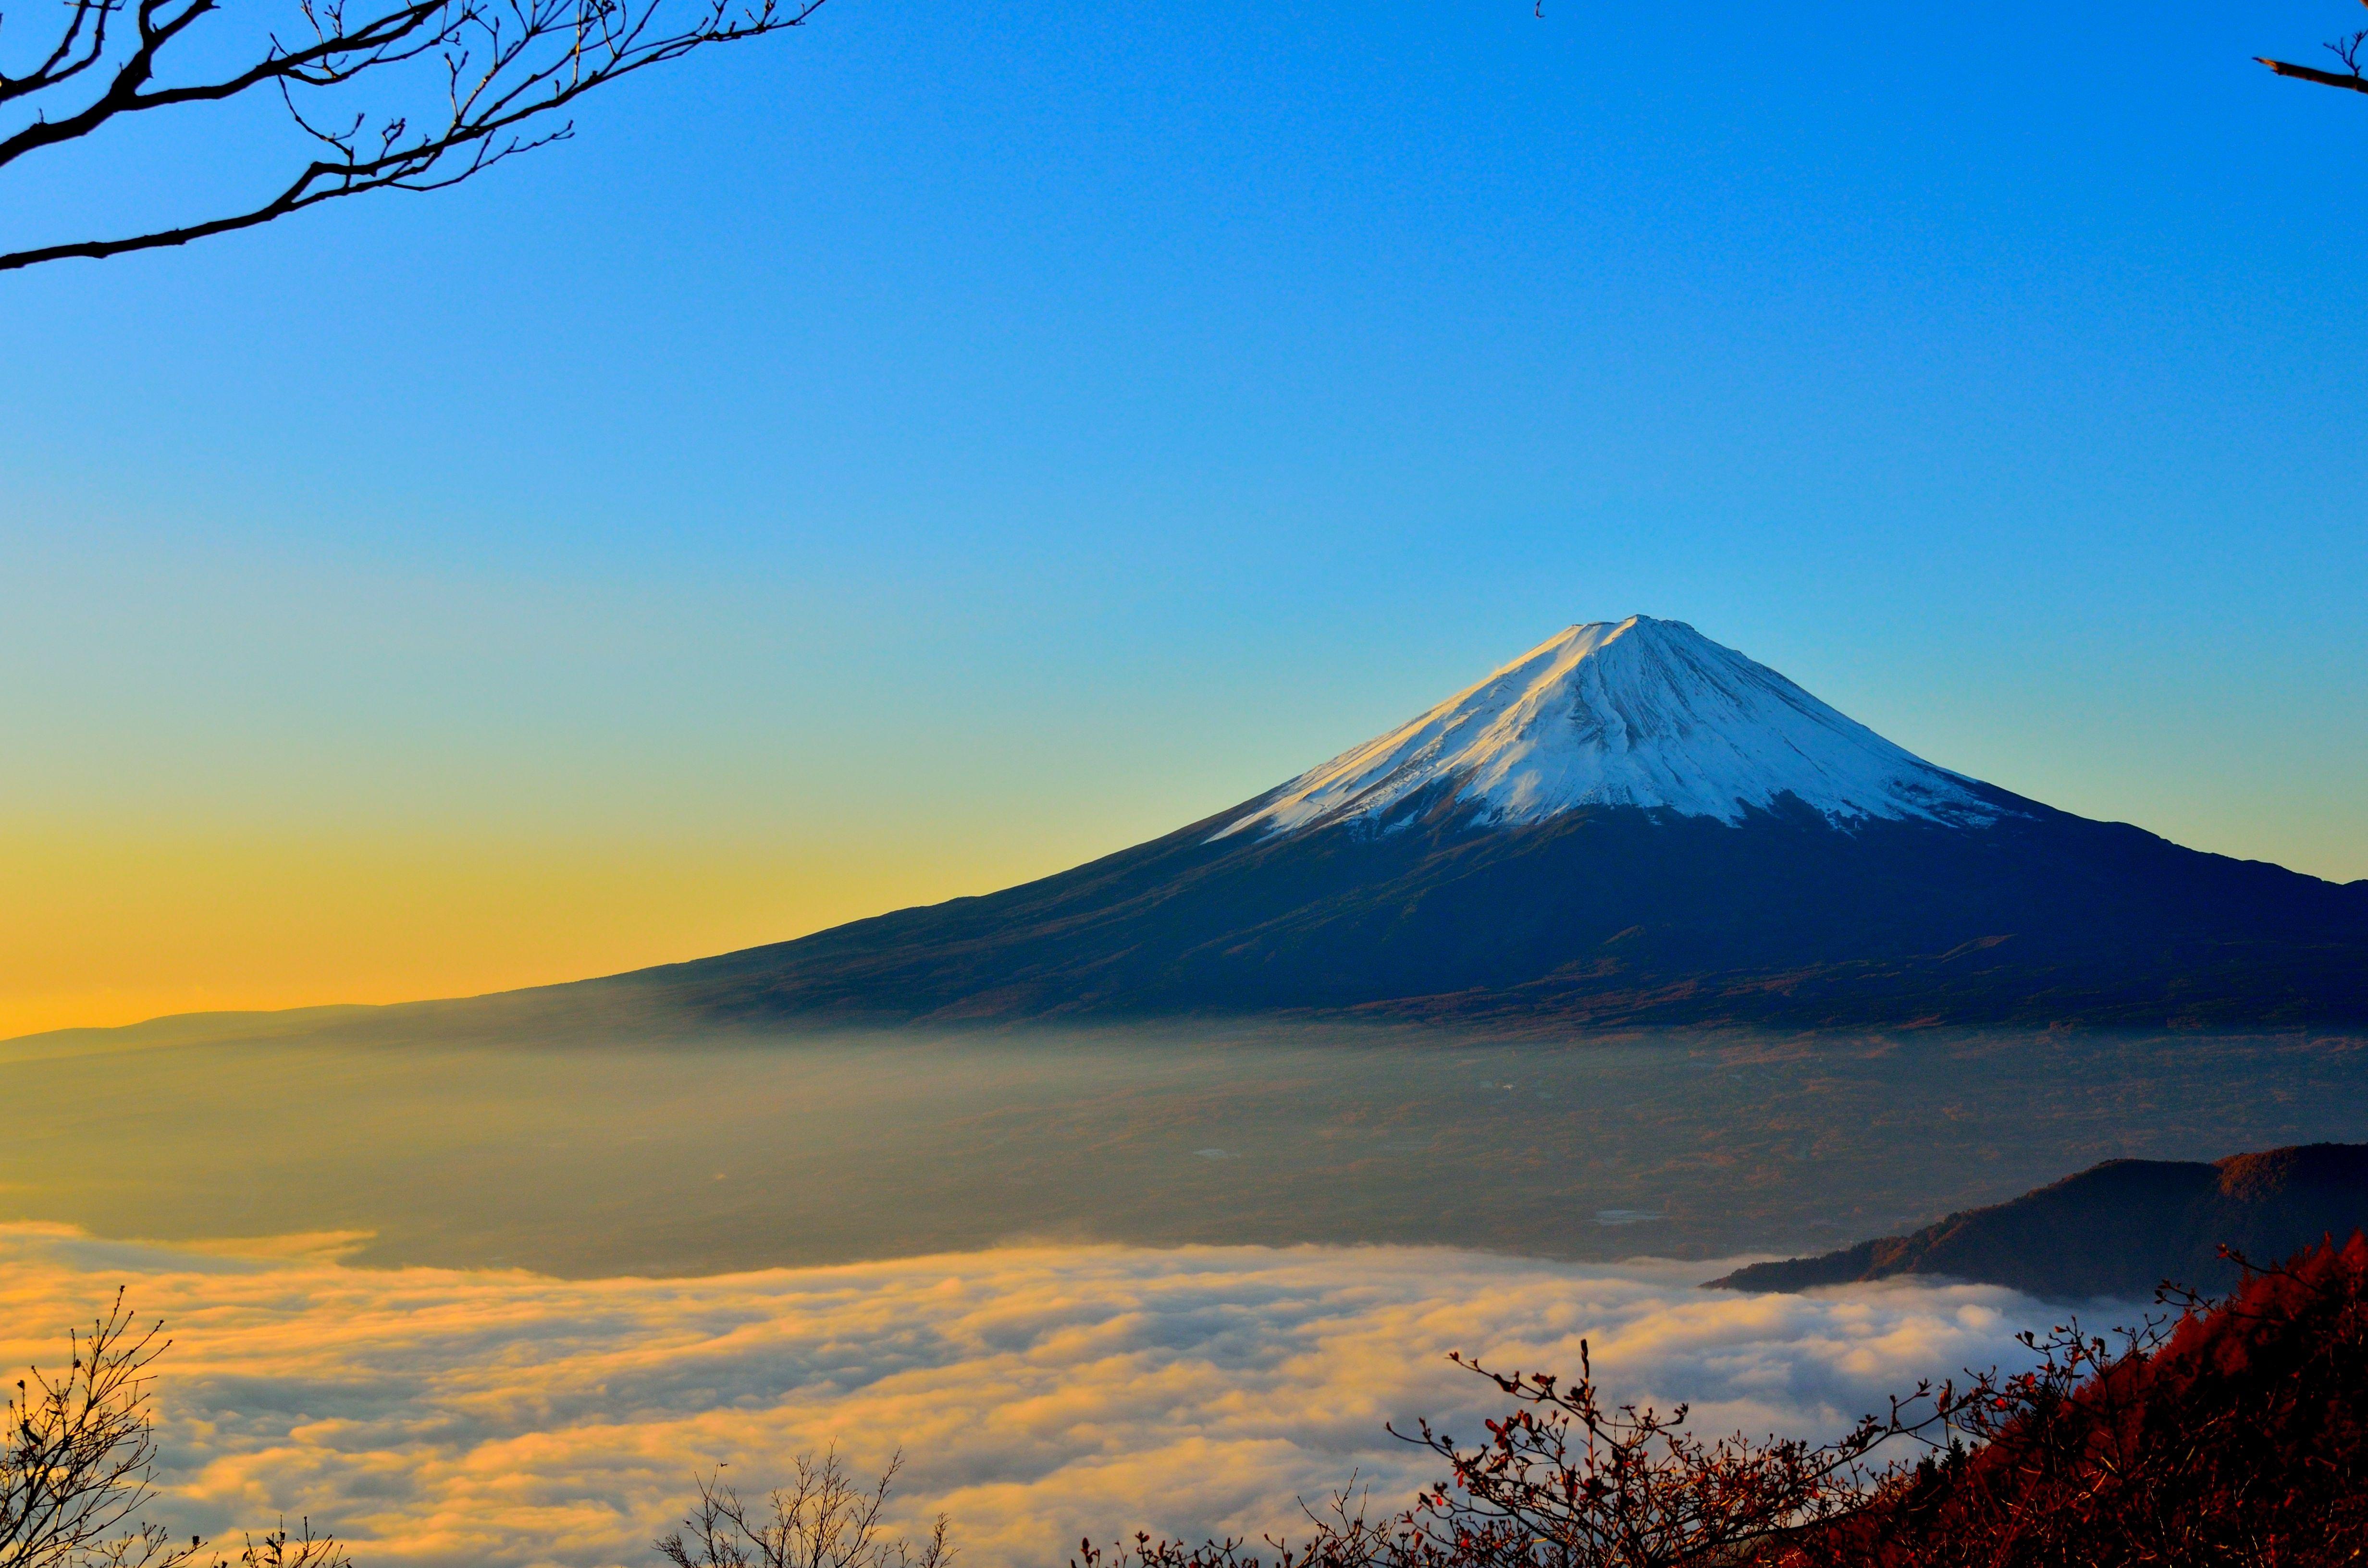 Mt. fuji, japan photo